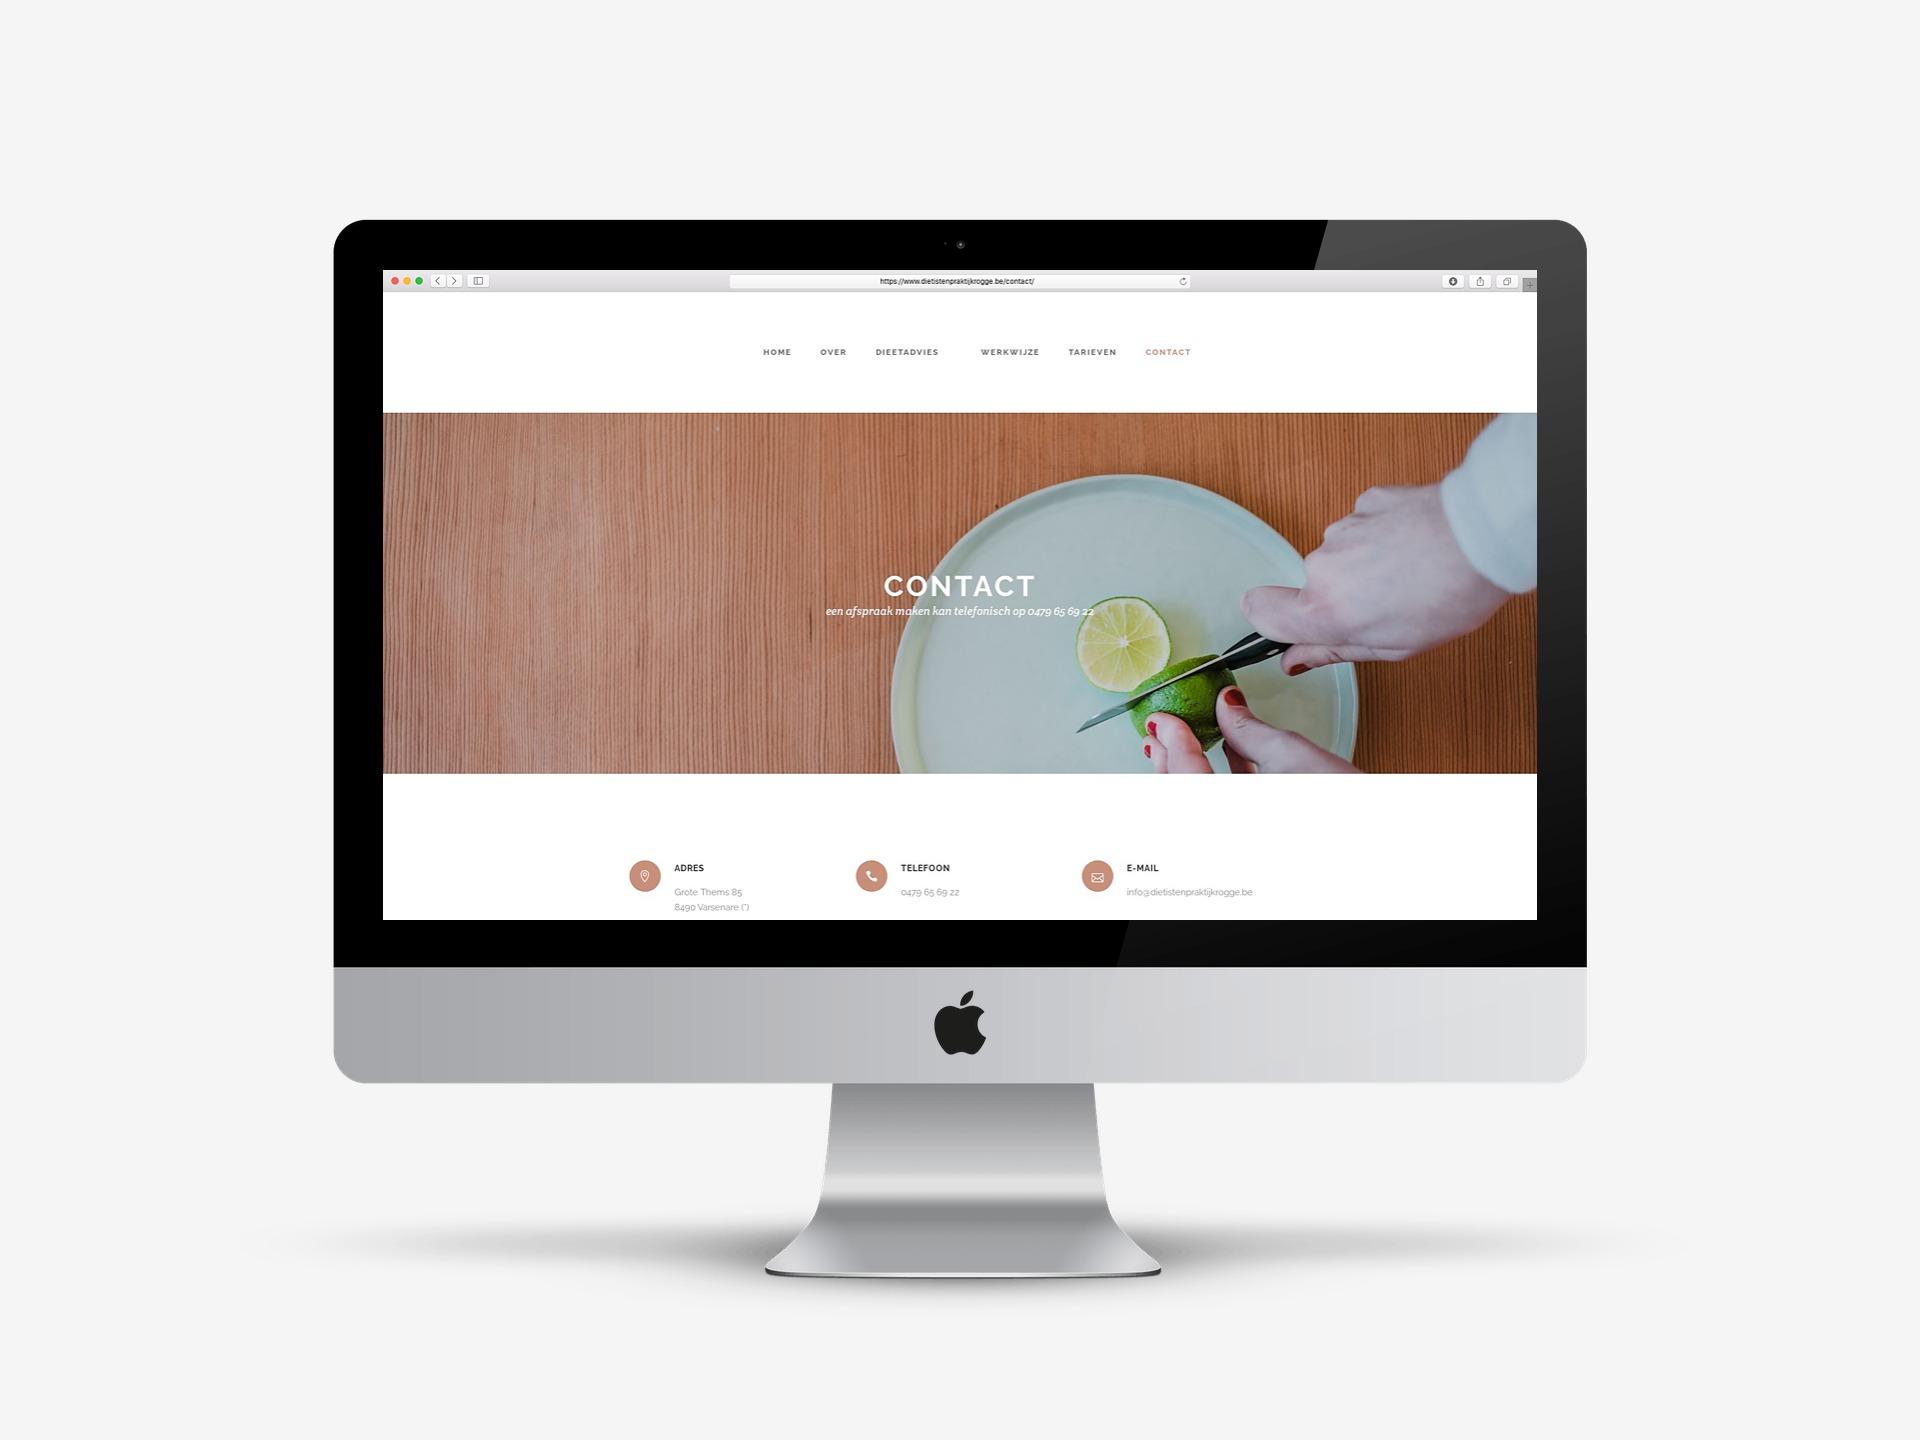 Dietistenpraktijk Rogge webdesign